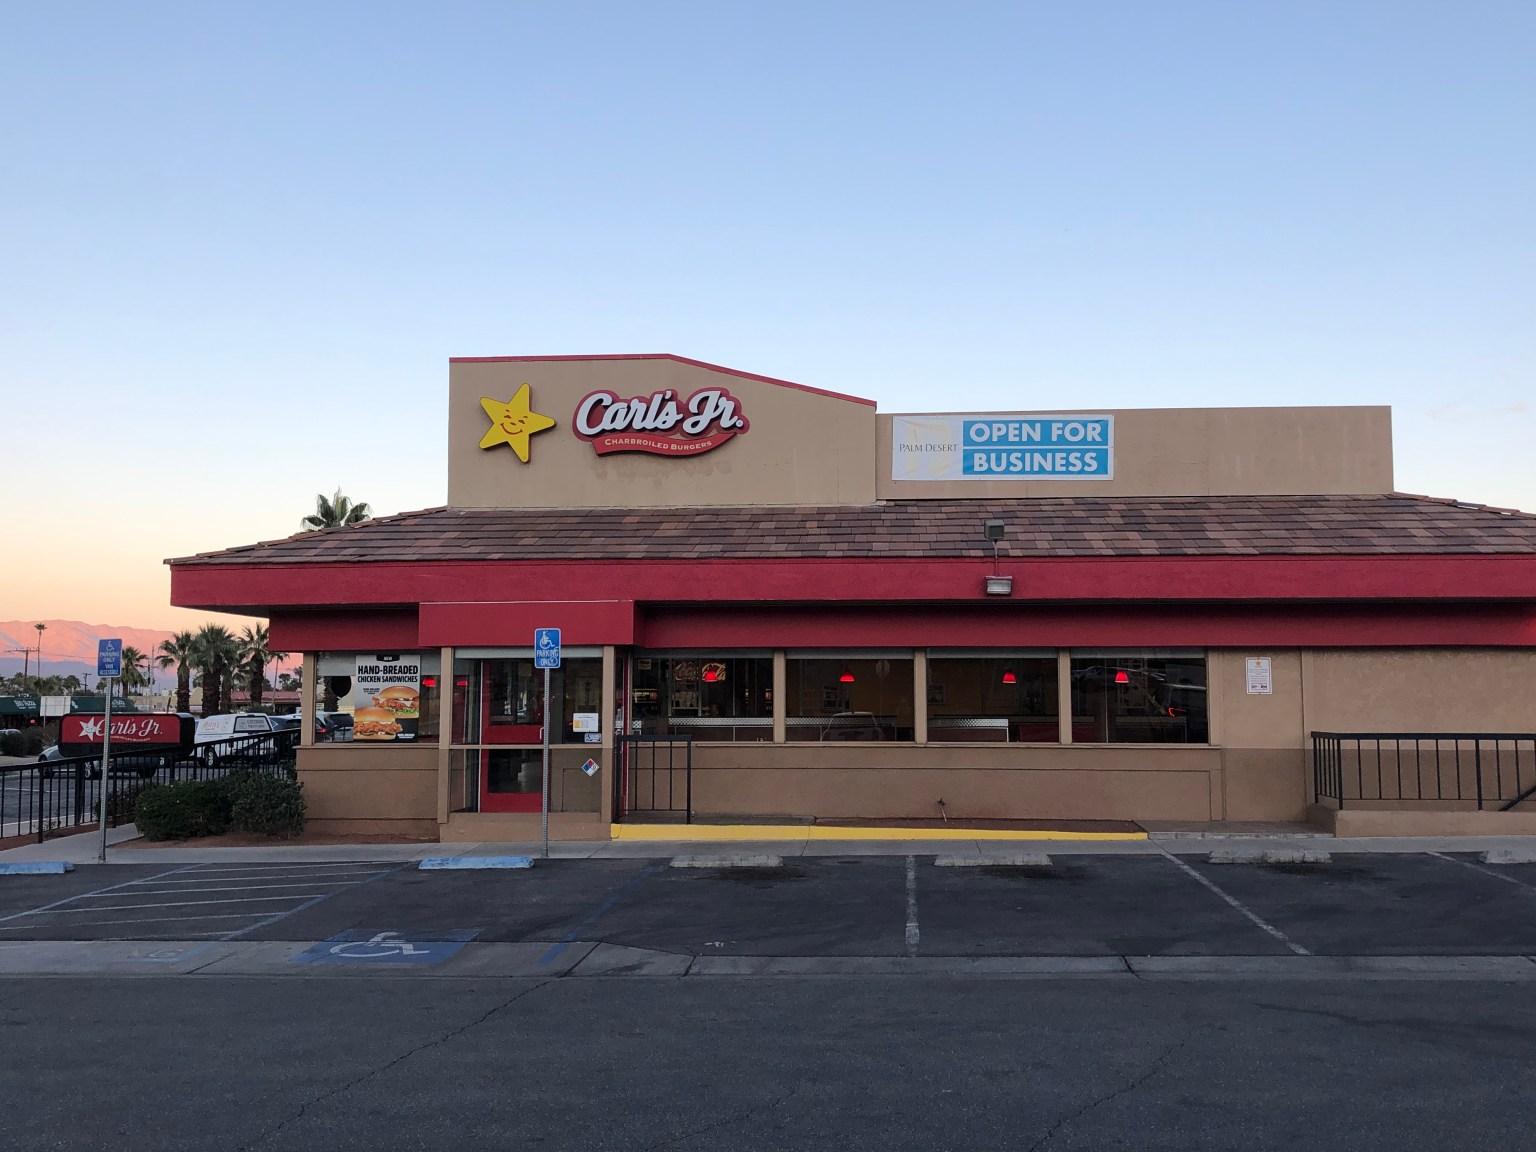 Palm Desert to consider allowing drive-through restaurants near HWY 111